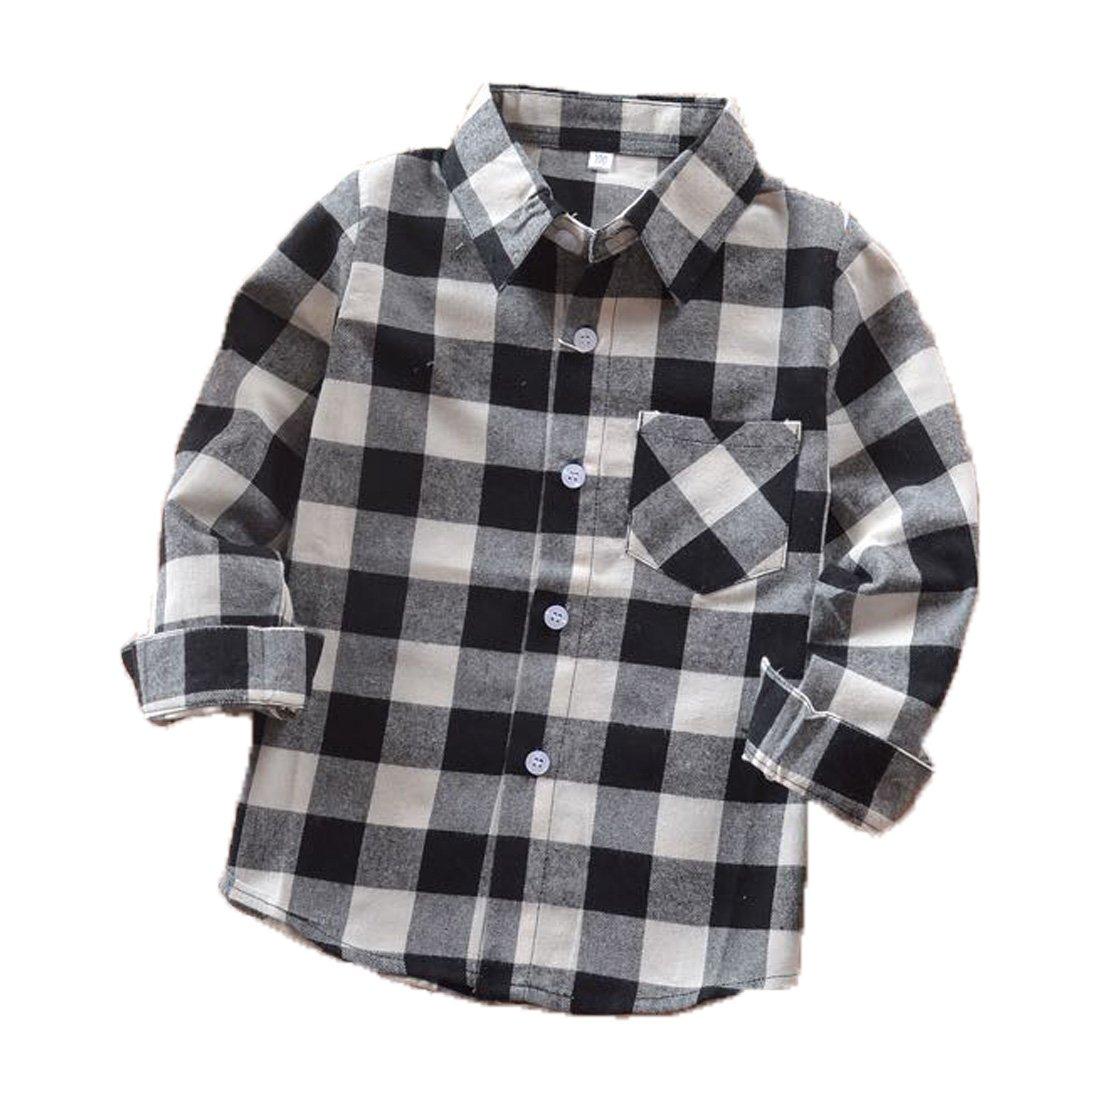 Rainlover Little Boys' Long Sleeve Button Down Plaid Flannel Shirt (5T, E004)